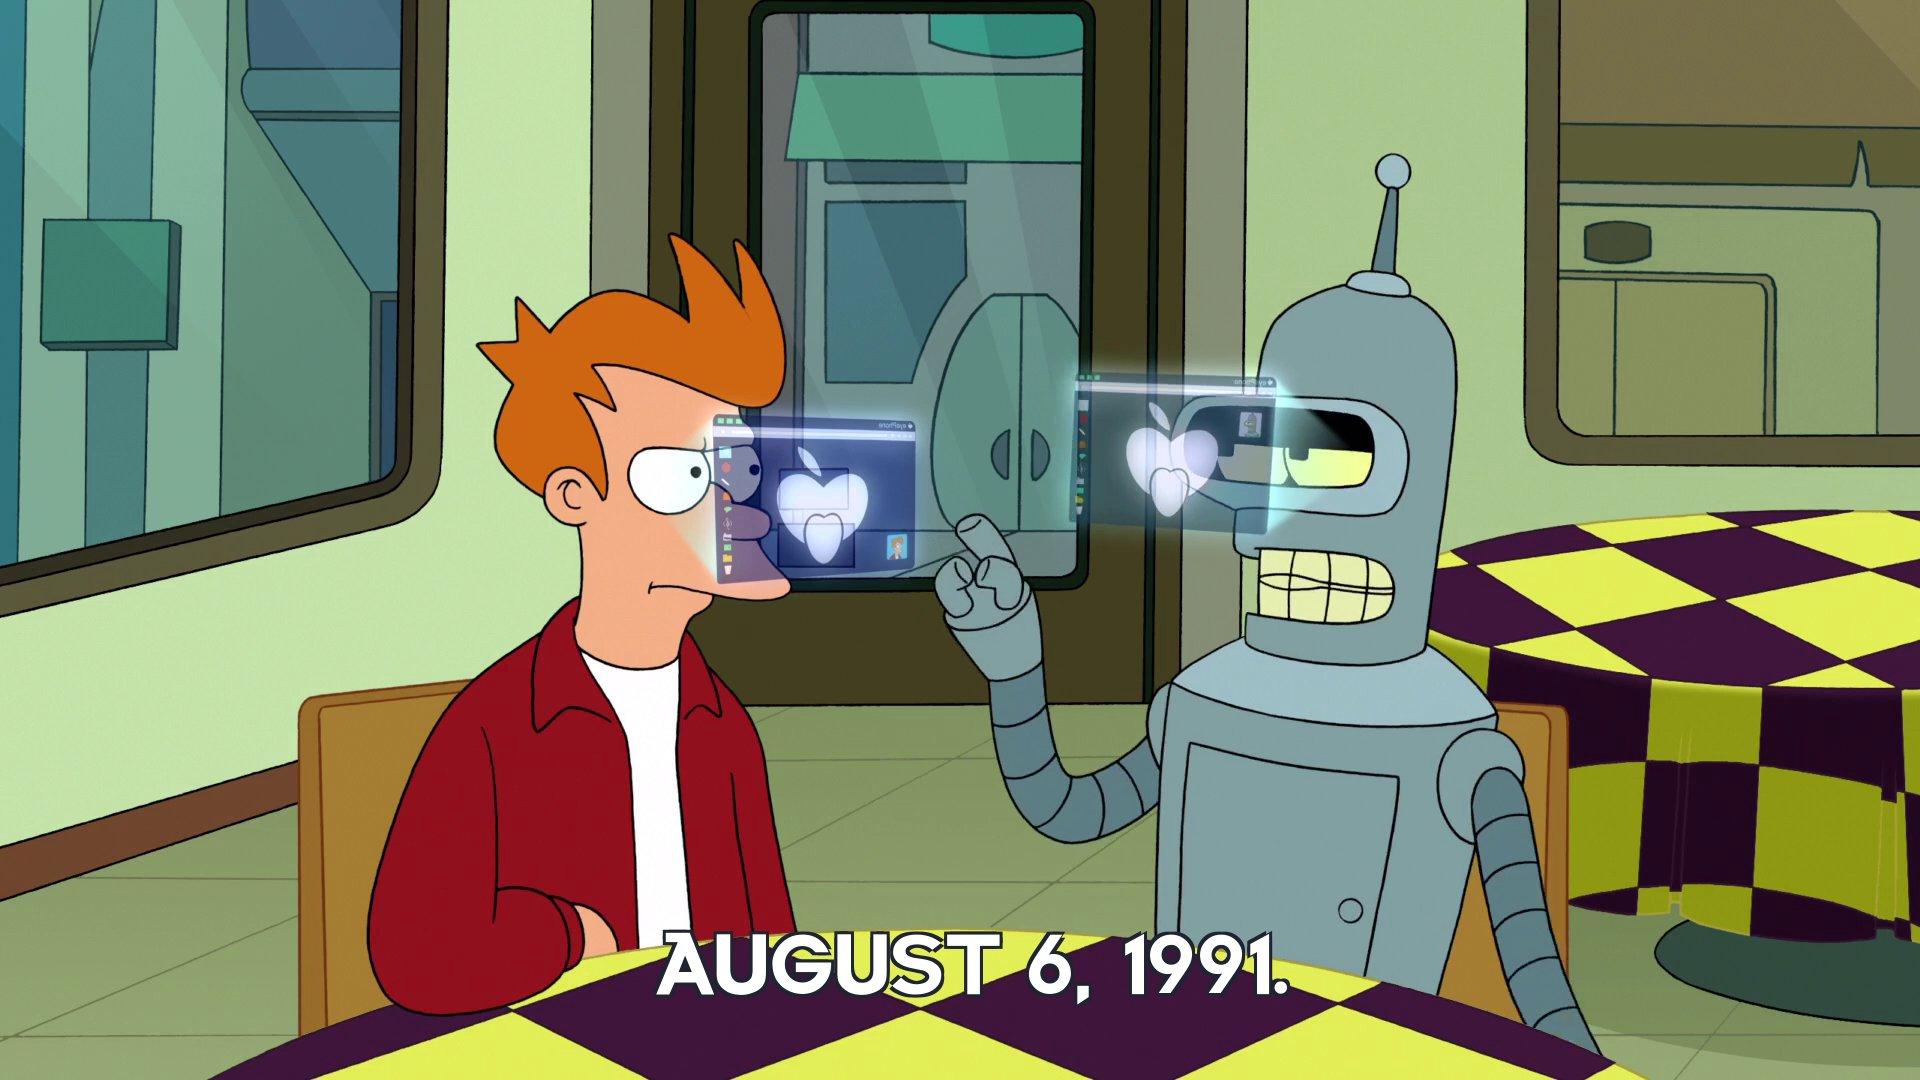 Bender Bending Rodriguez: August 6, 1991.